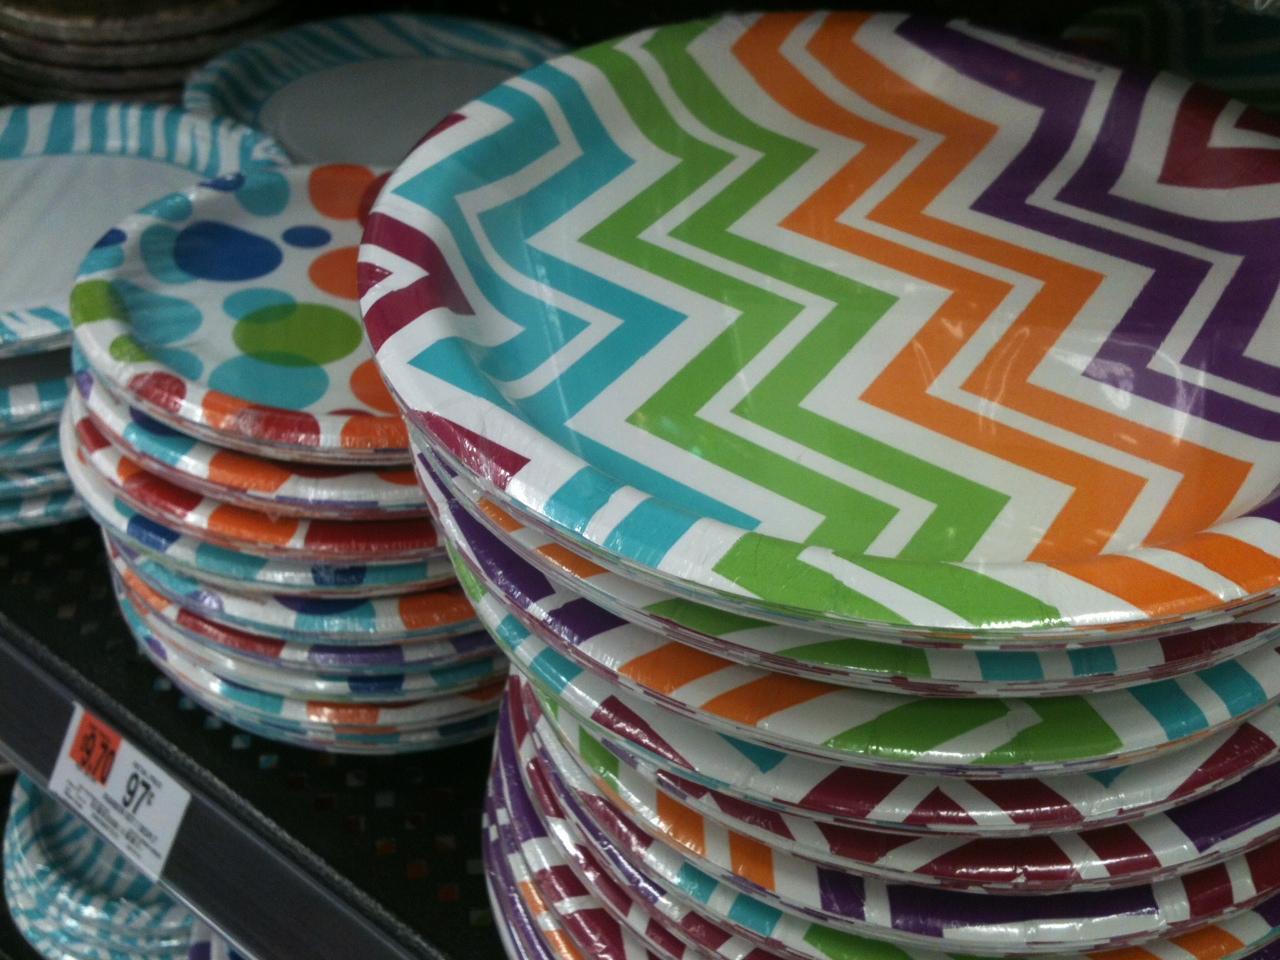 Party Supplies at Walmart & Design Megillah: Party Supplies at Walmart